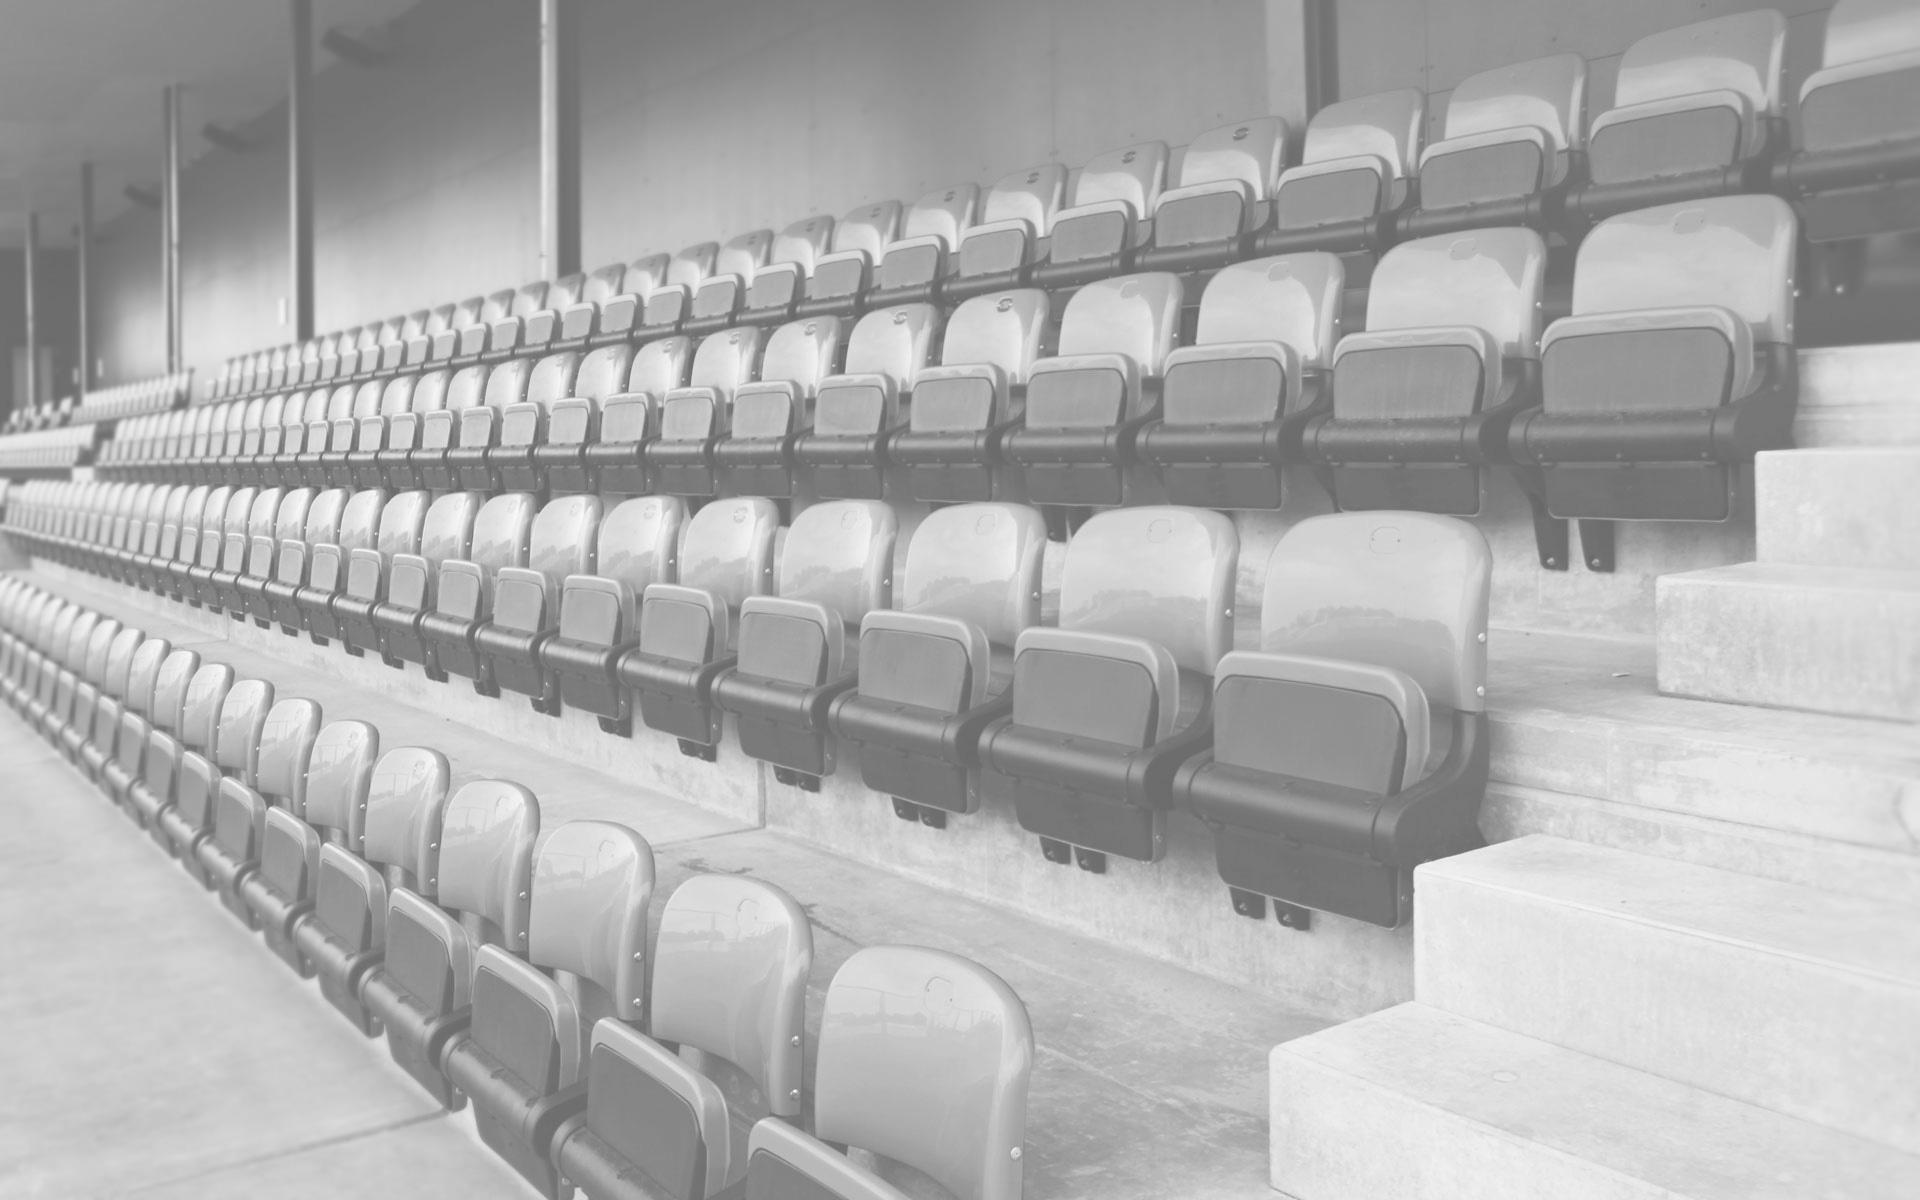 BG4-Femhoje-Stadioncenter